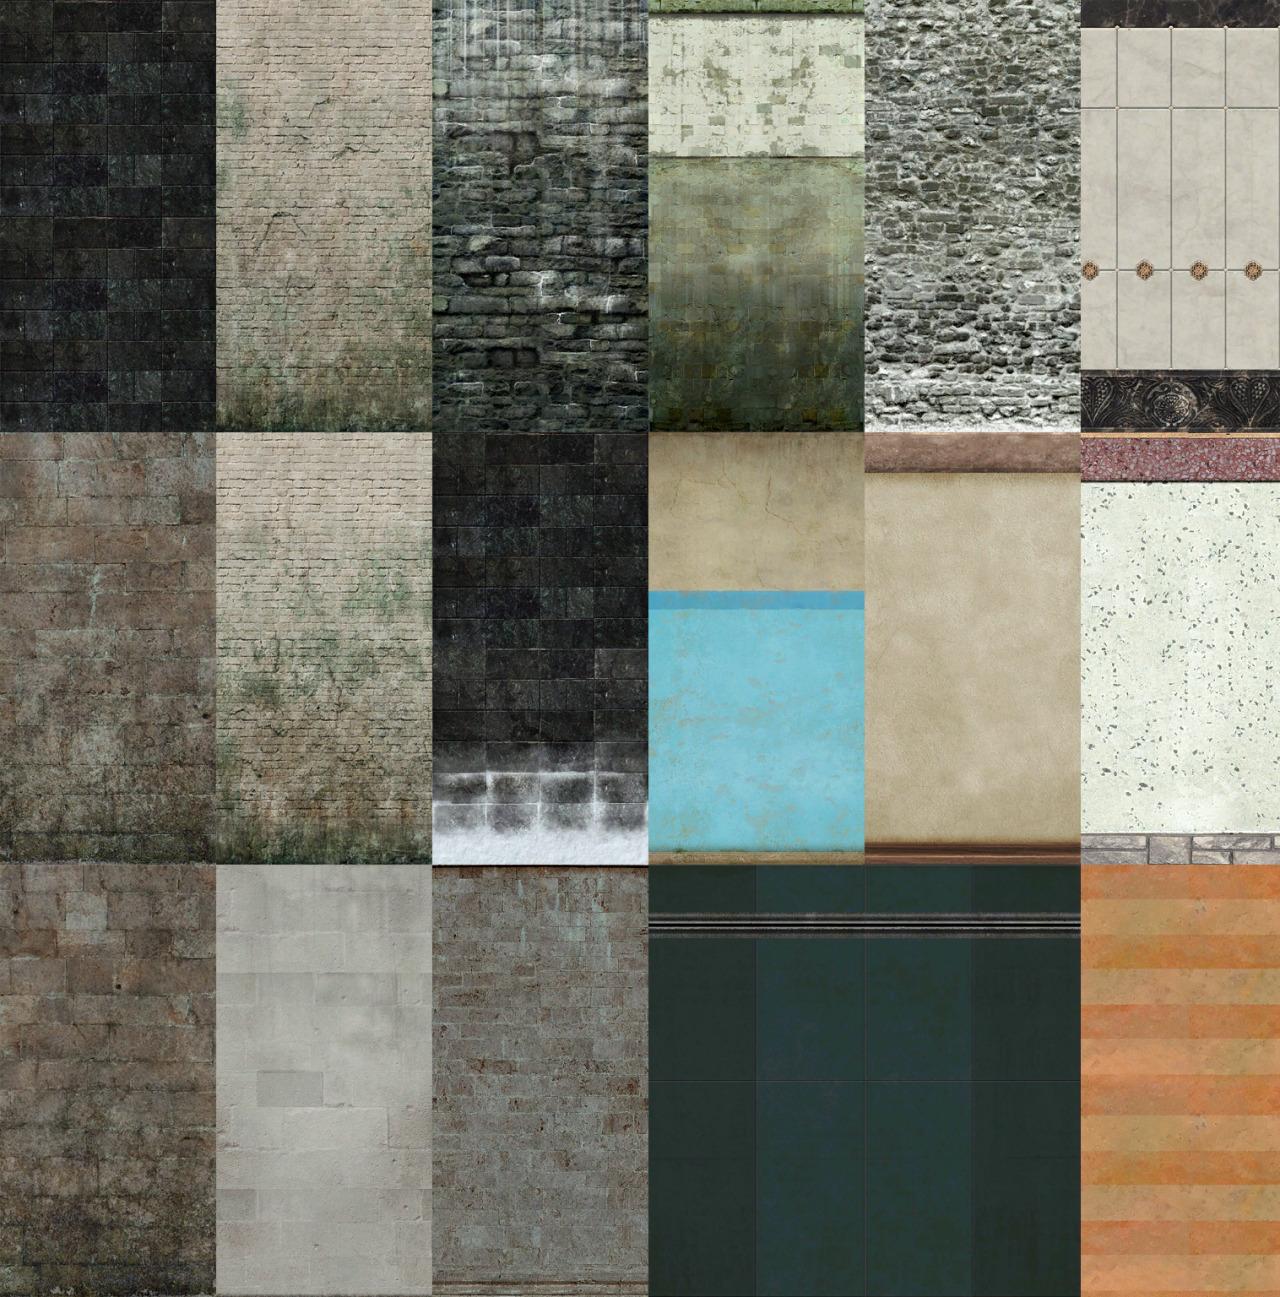 TS4 - Yuxi - Dream Fall Walls ~ Noir and Dark Sims Sims 1 Walls